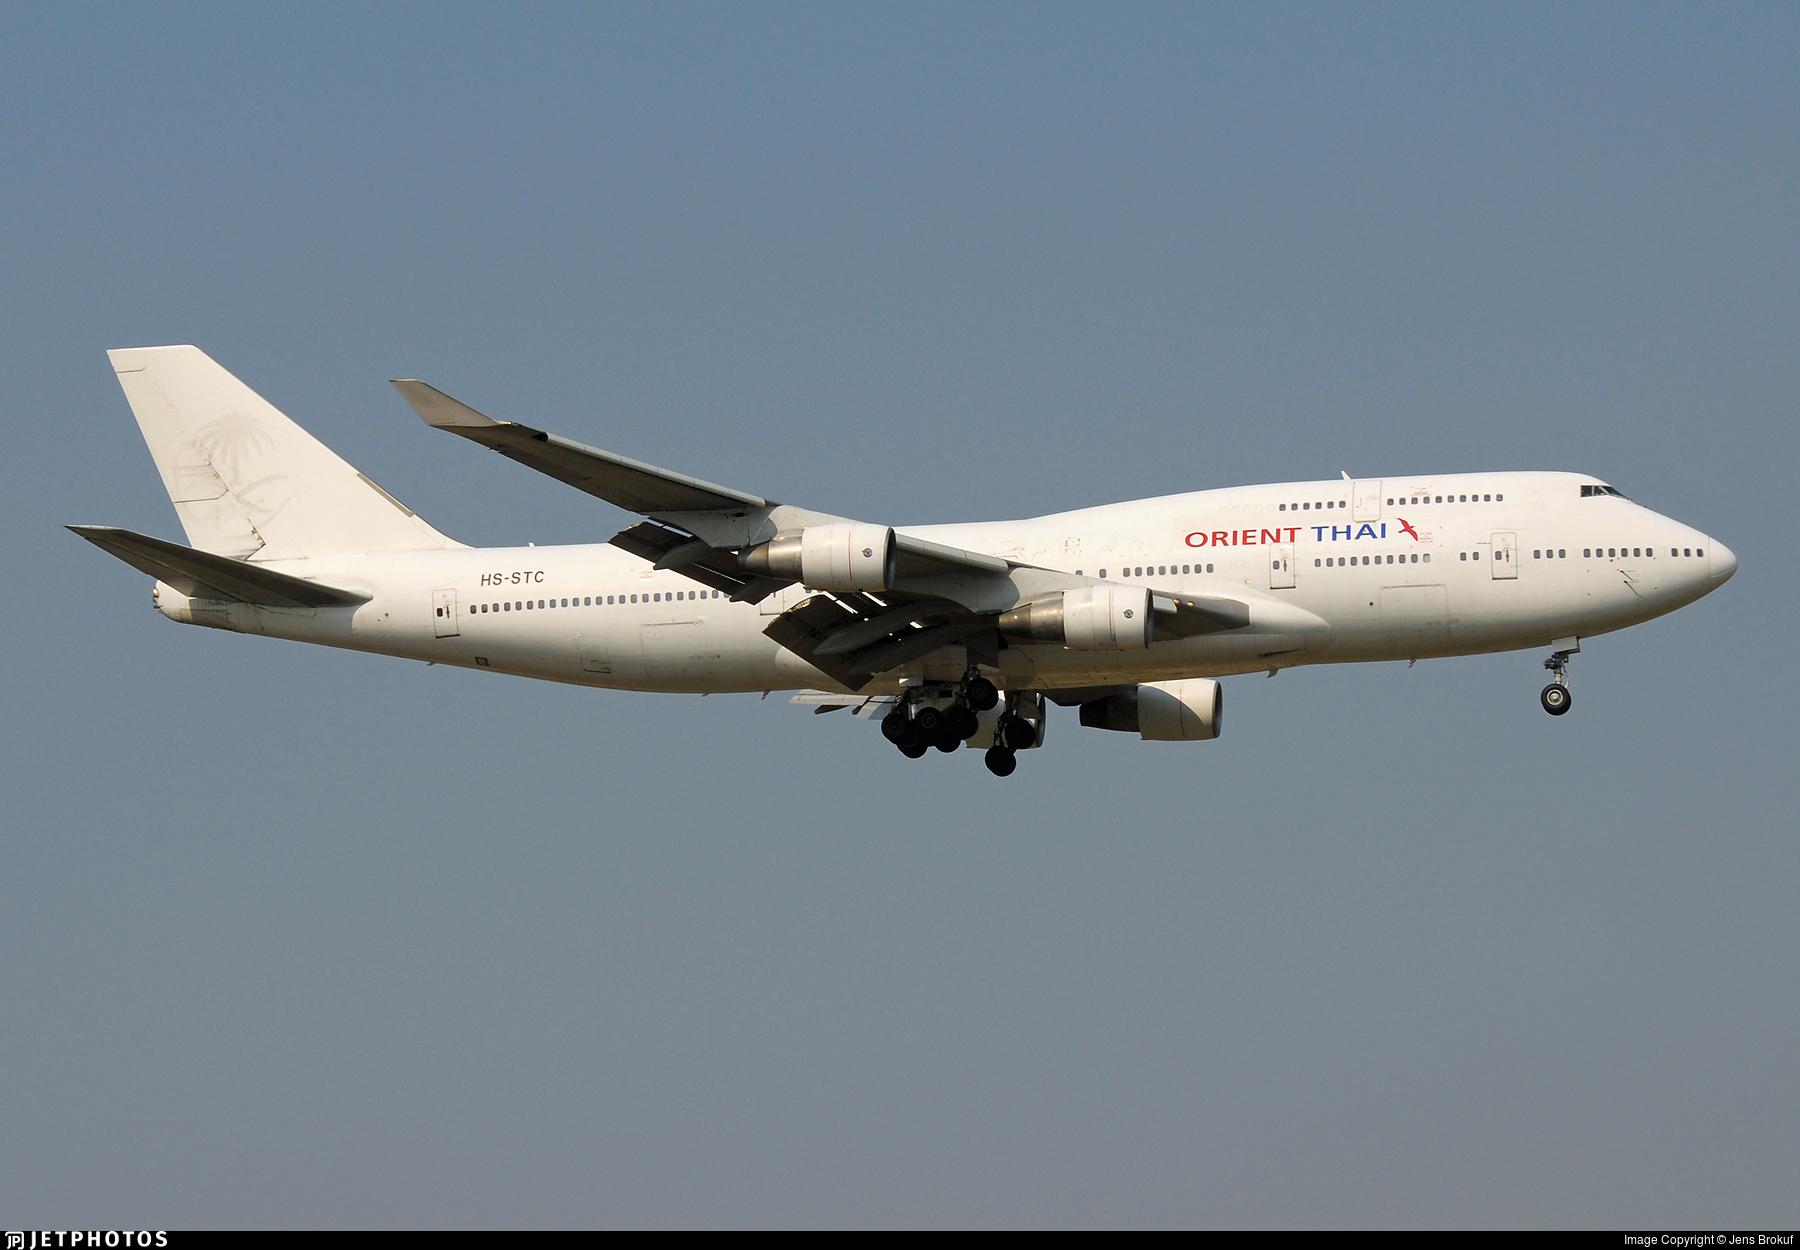 HS-STC - Boeing 747-412 - Orient Thai Airlines